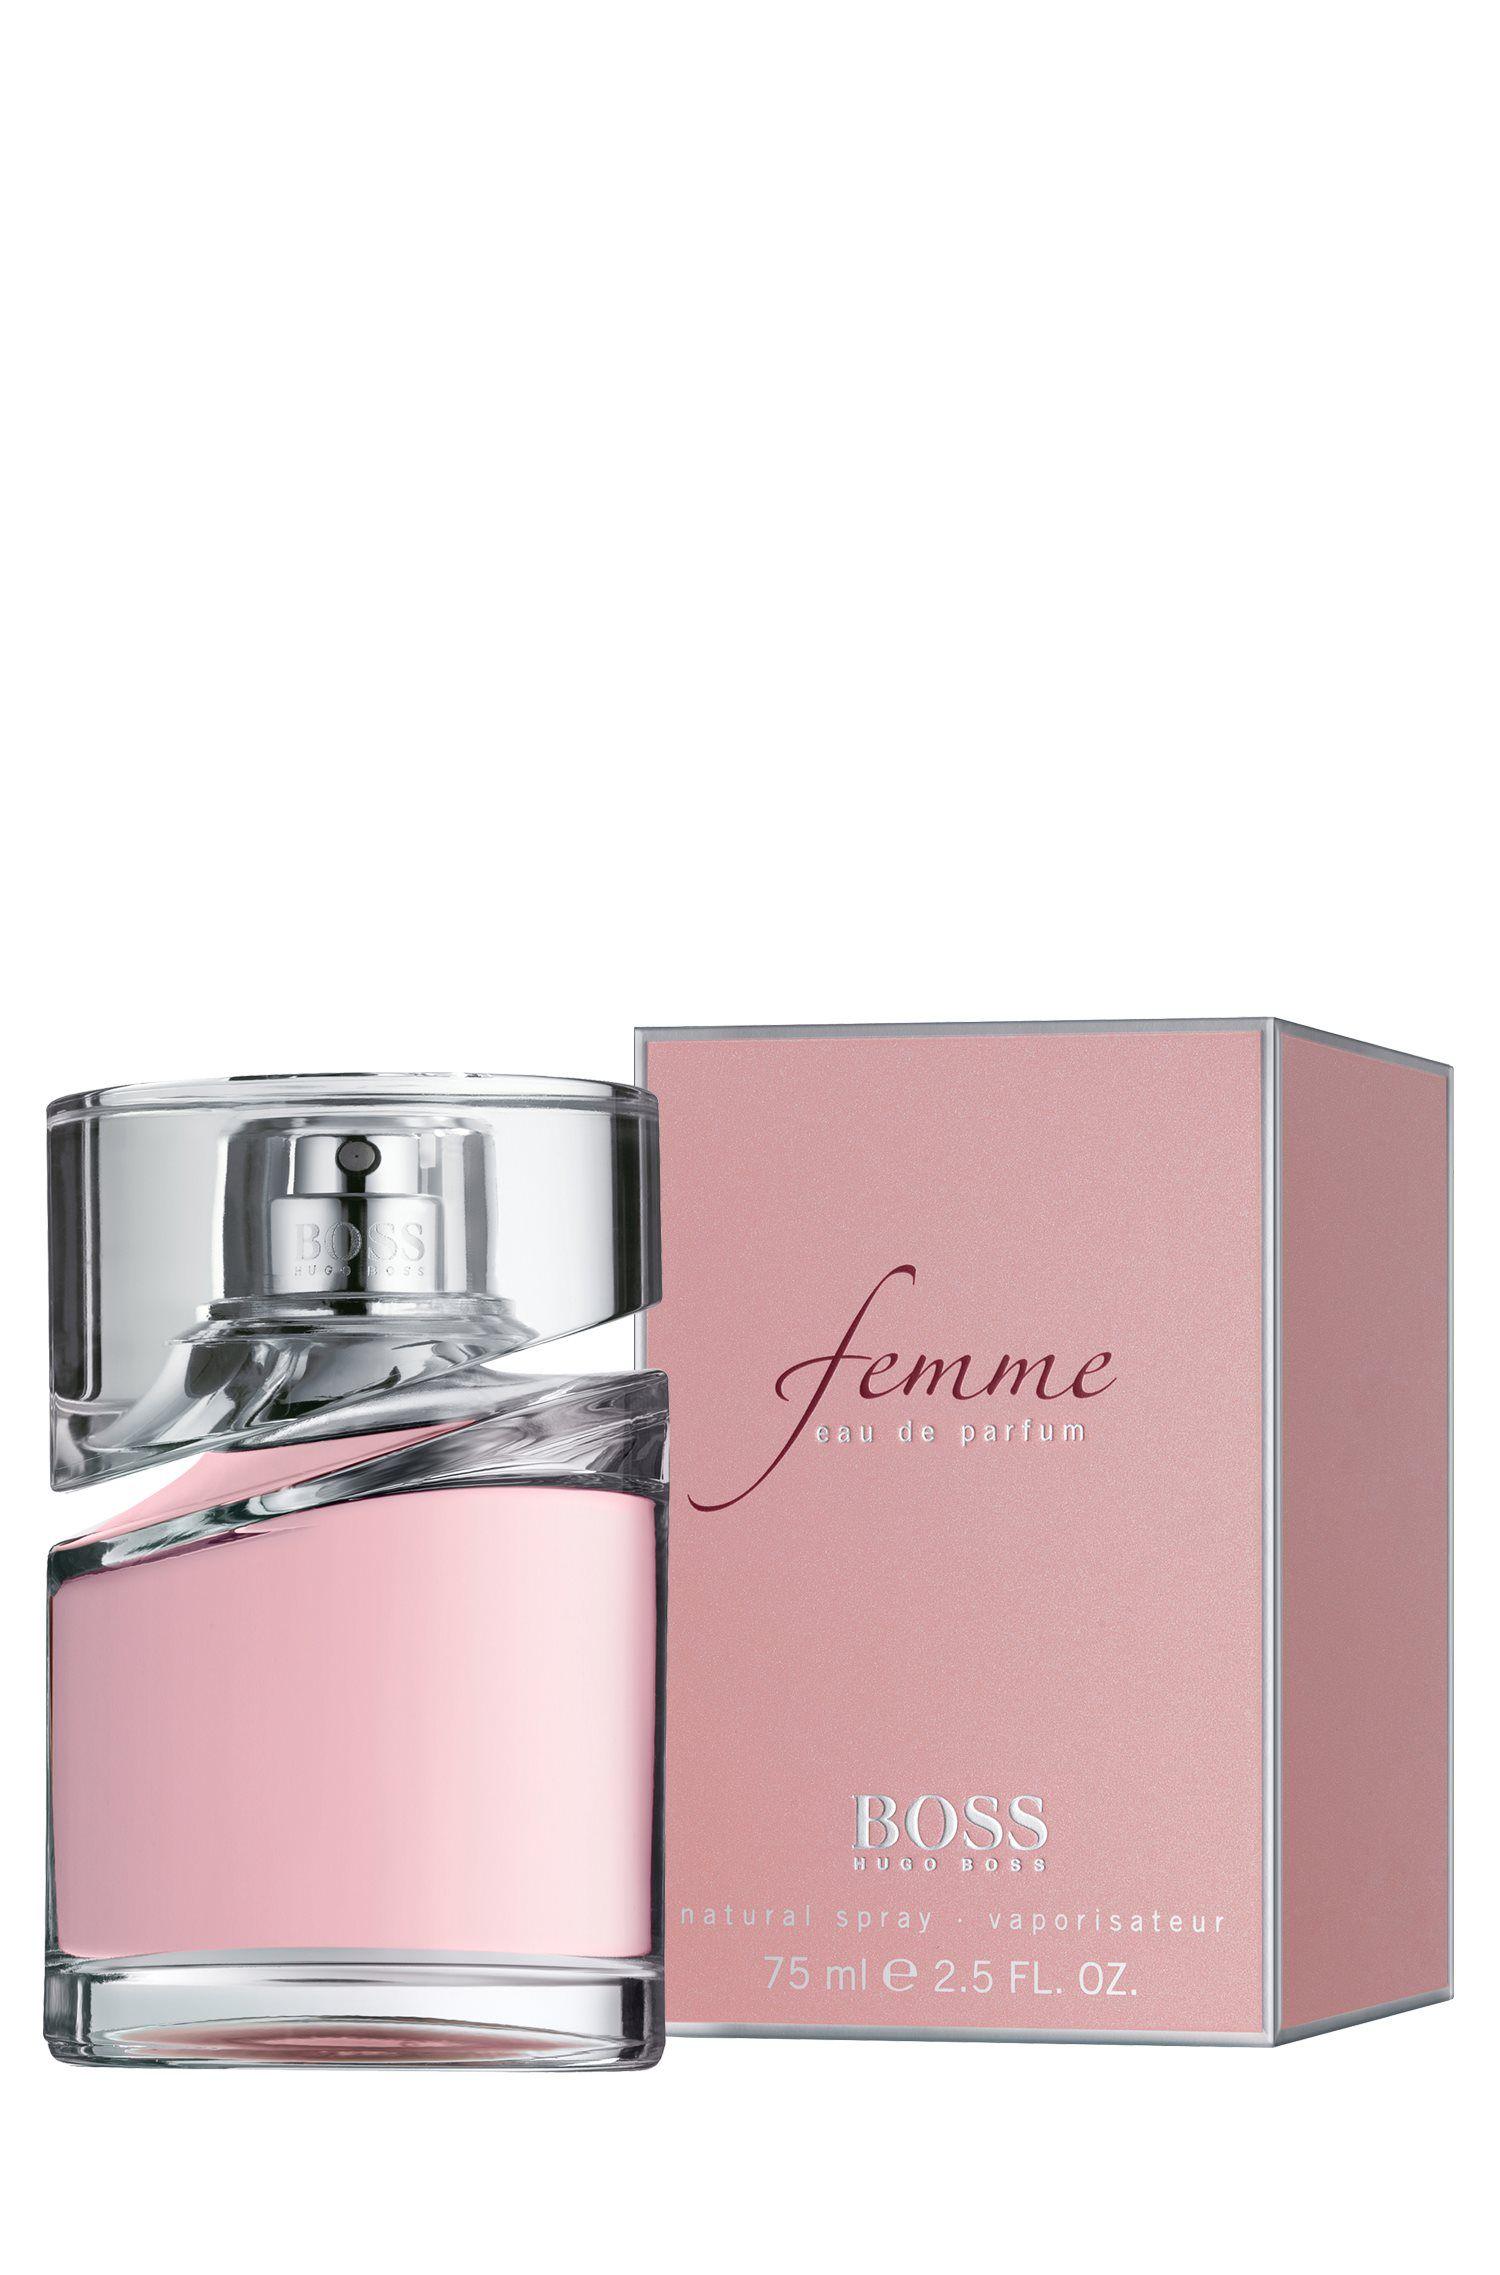 Femme by BOSS eau de parfum 75ml , Assorted-Pre-Pack